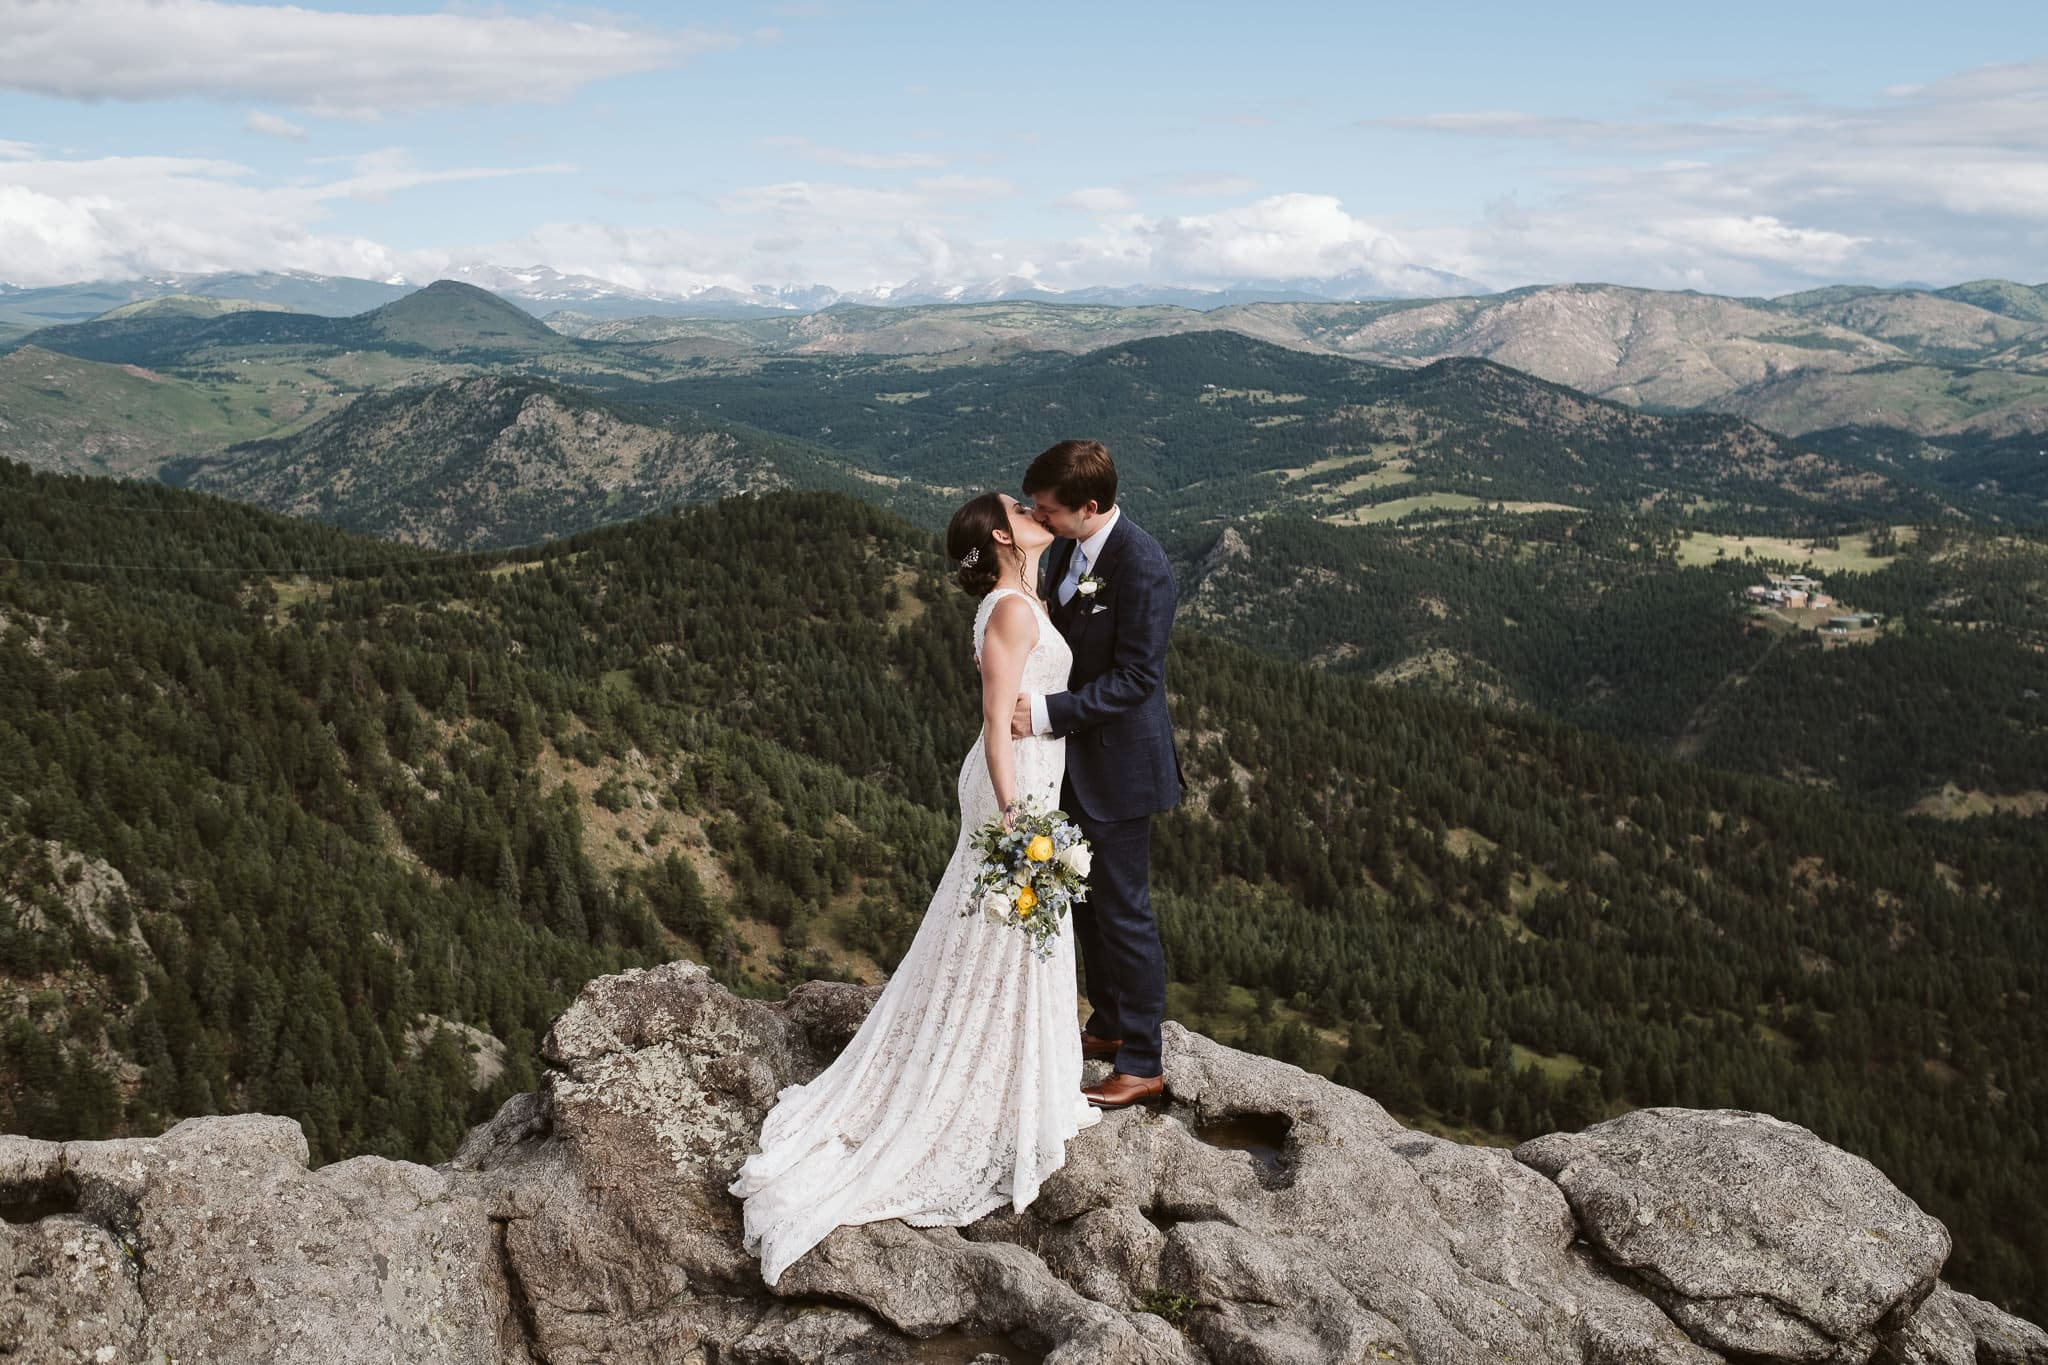 Lost Gulch Overlook elopement in Boulder, Colorado